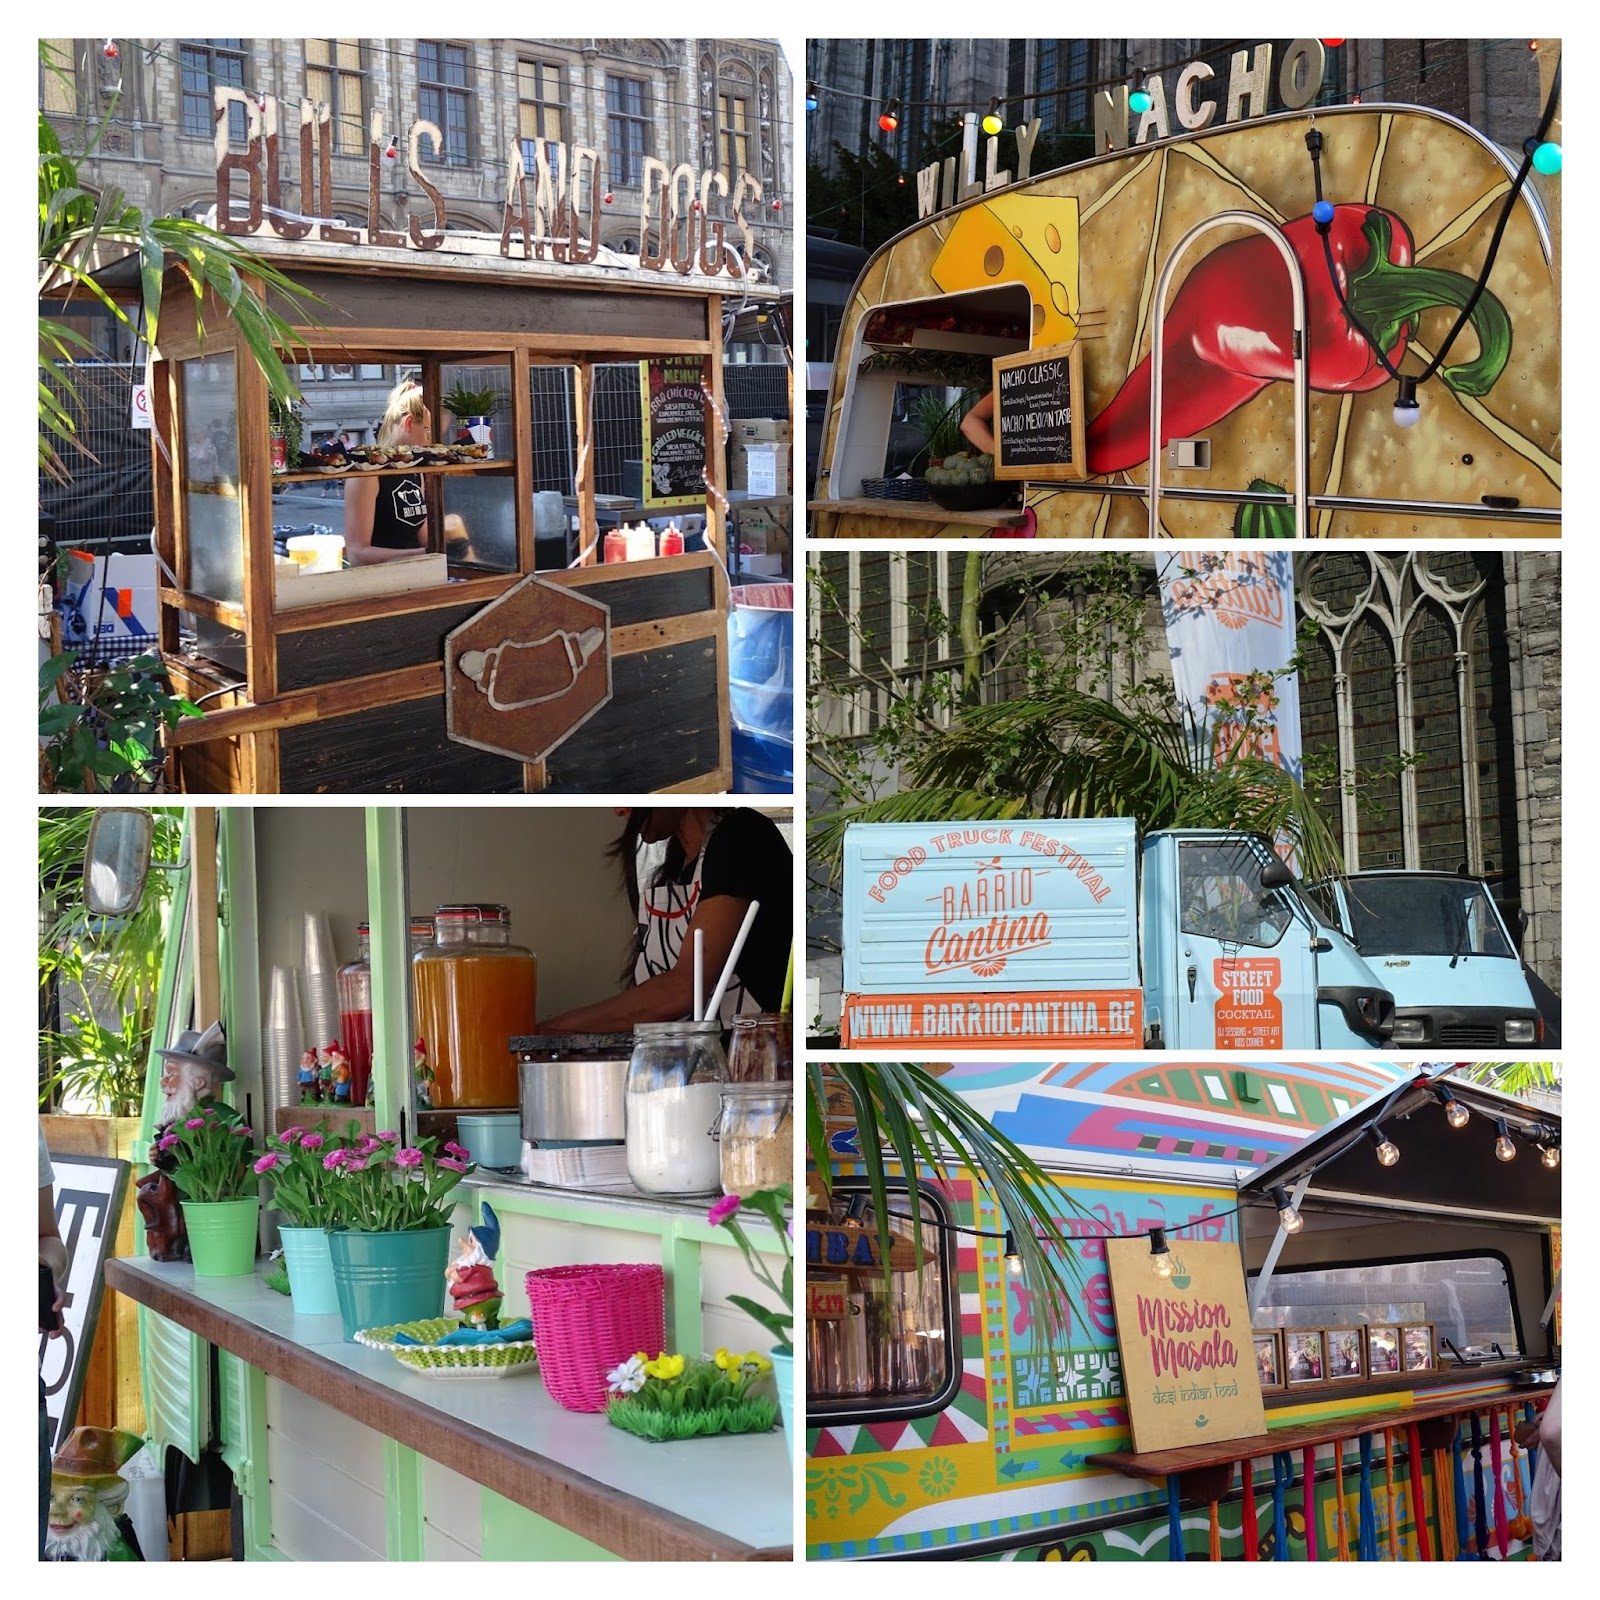 gandprintempsfestivalfoodtrucks belgique